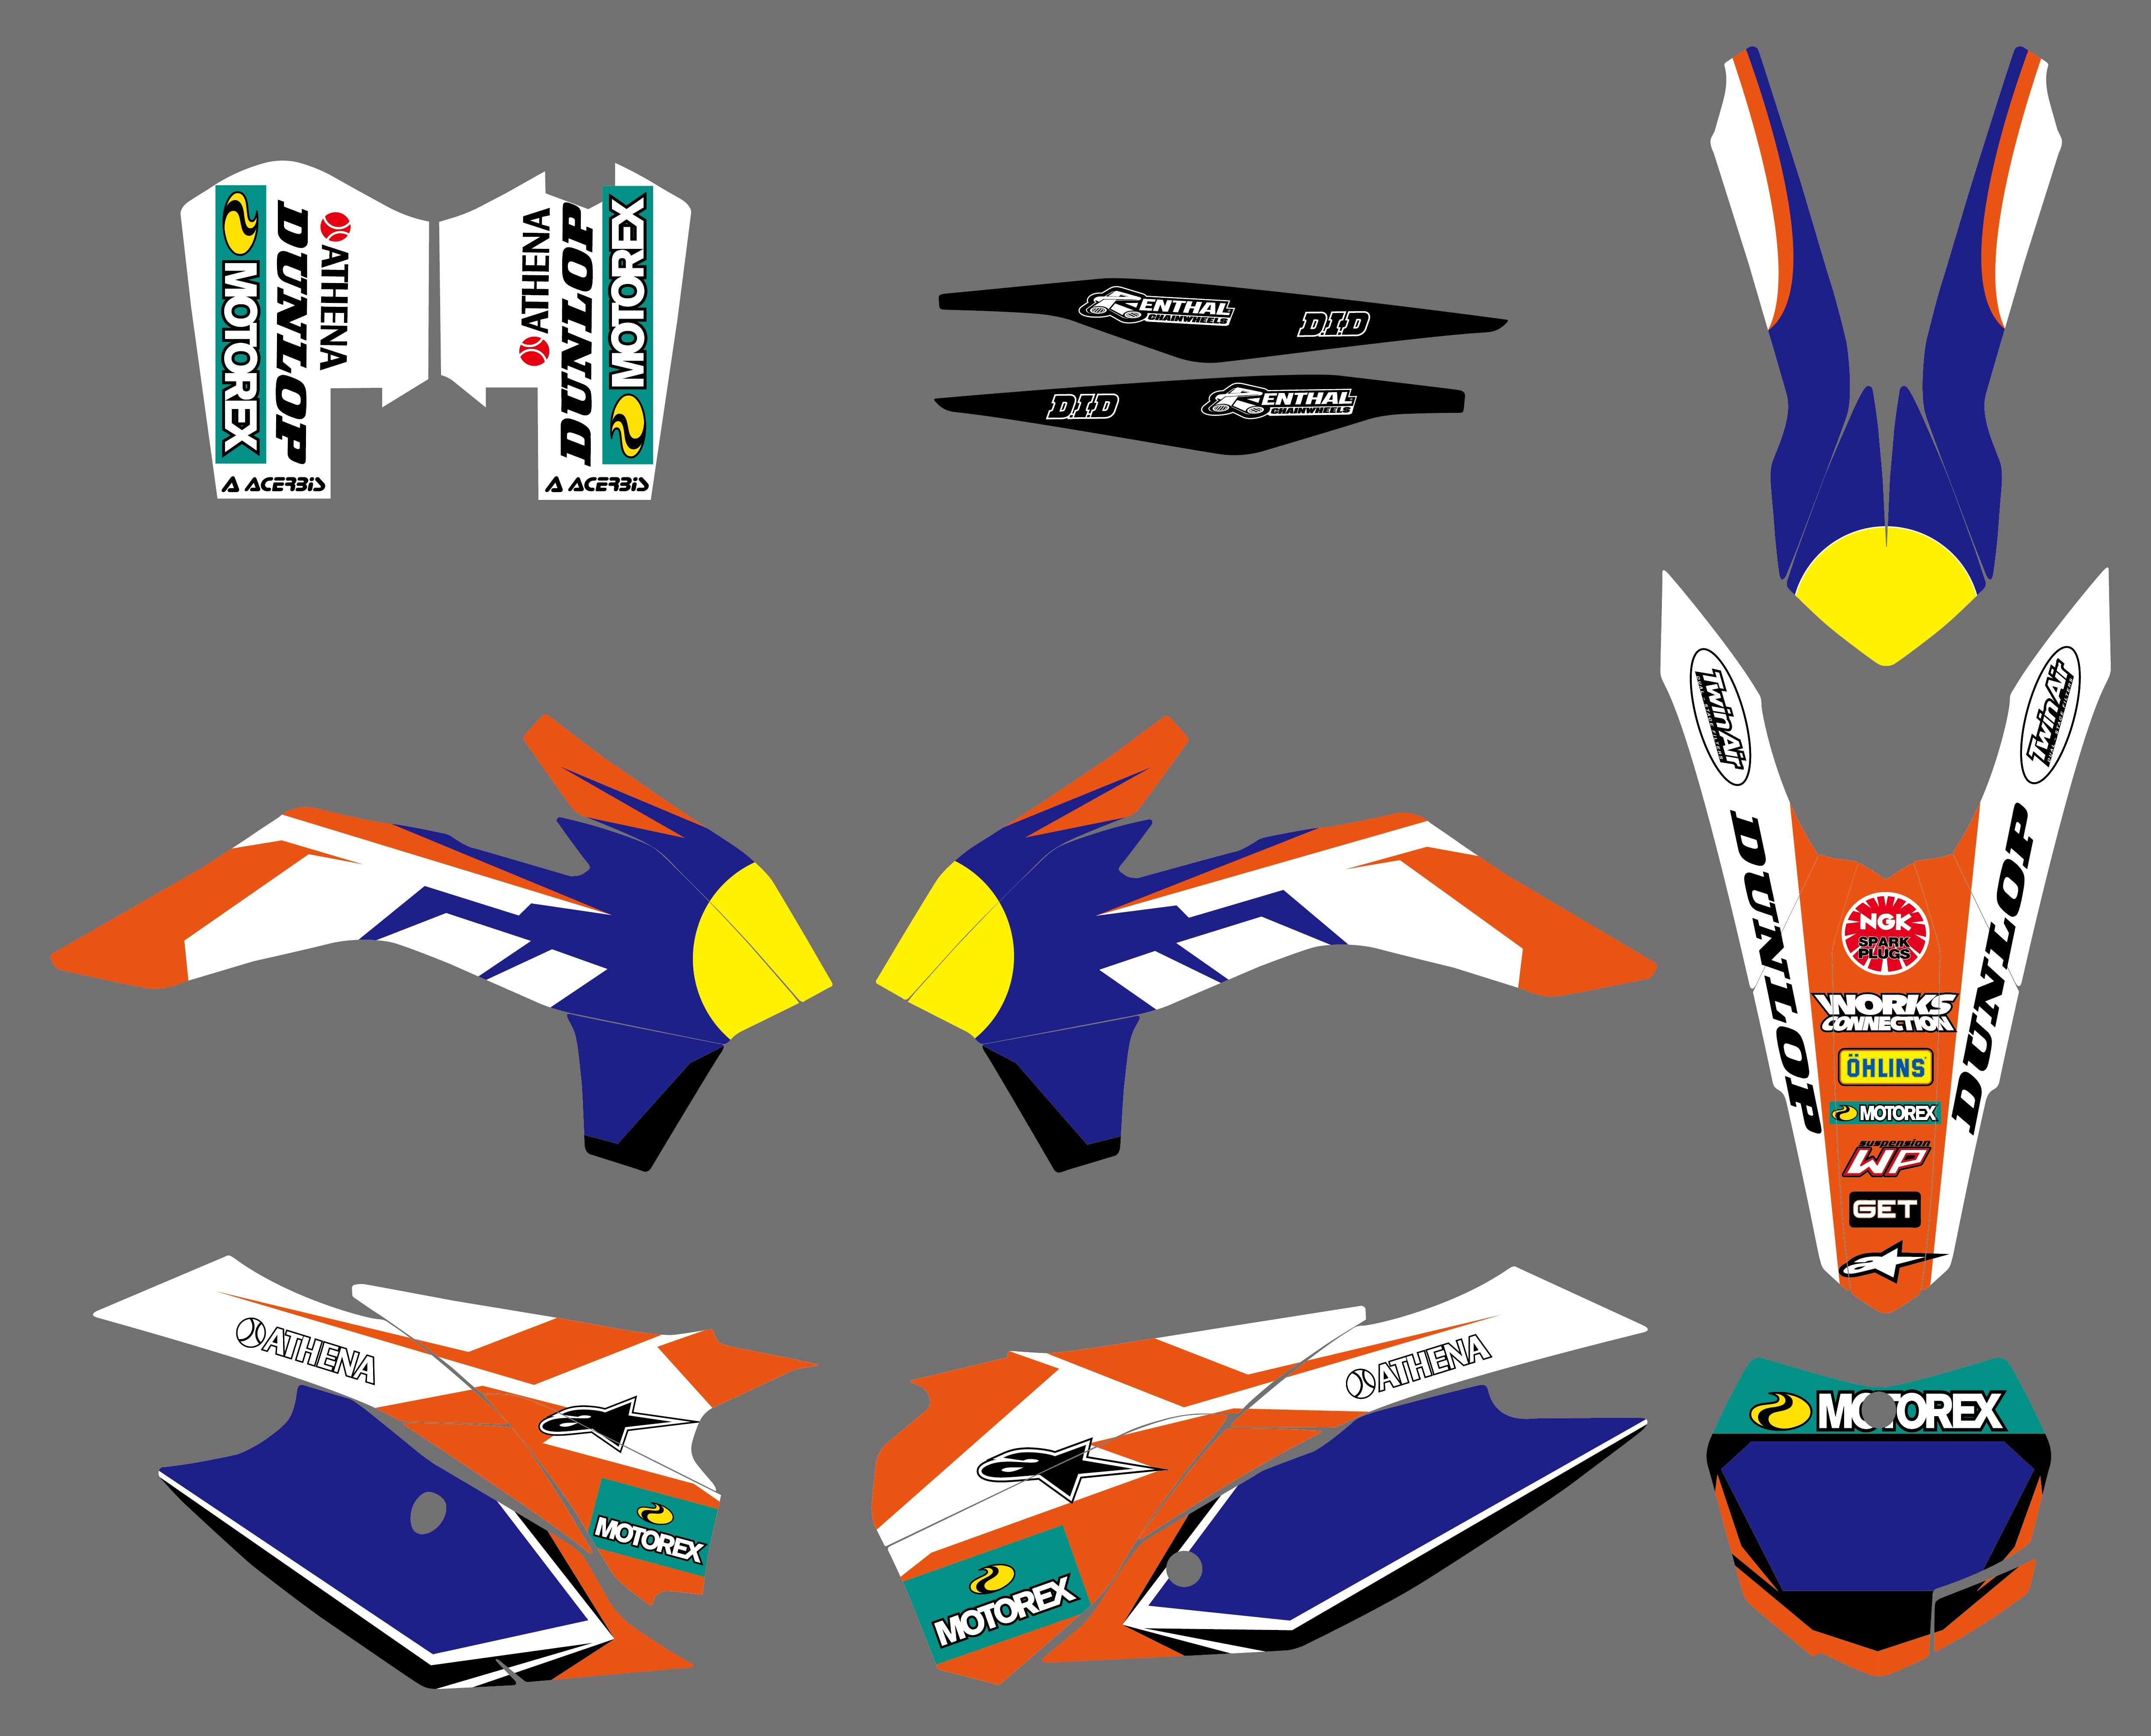 NICECNC Equipe Gráfico de Fundo Decalques Autocolantes Kit Para KTM SX SXF XC XCF SX-F XC-F 125 150 200 250 300 350 400 450 2013-2015